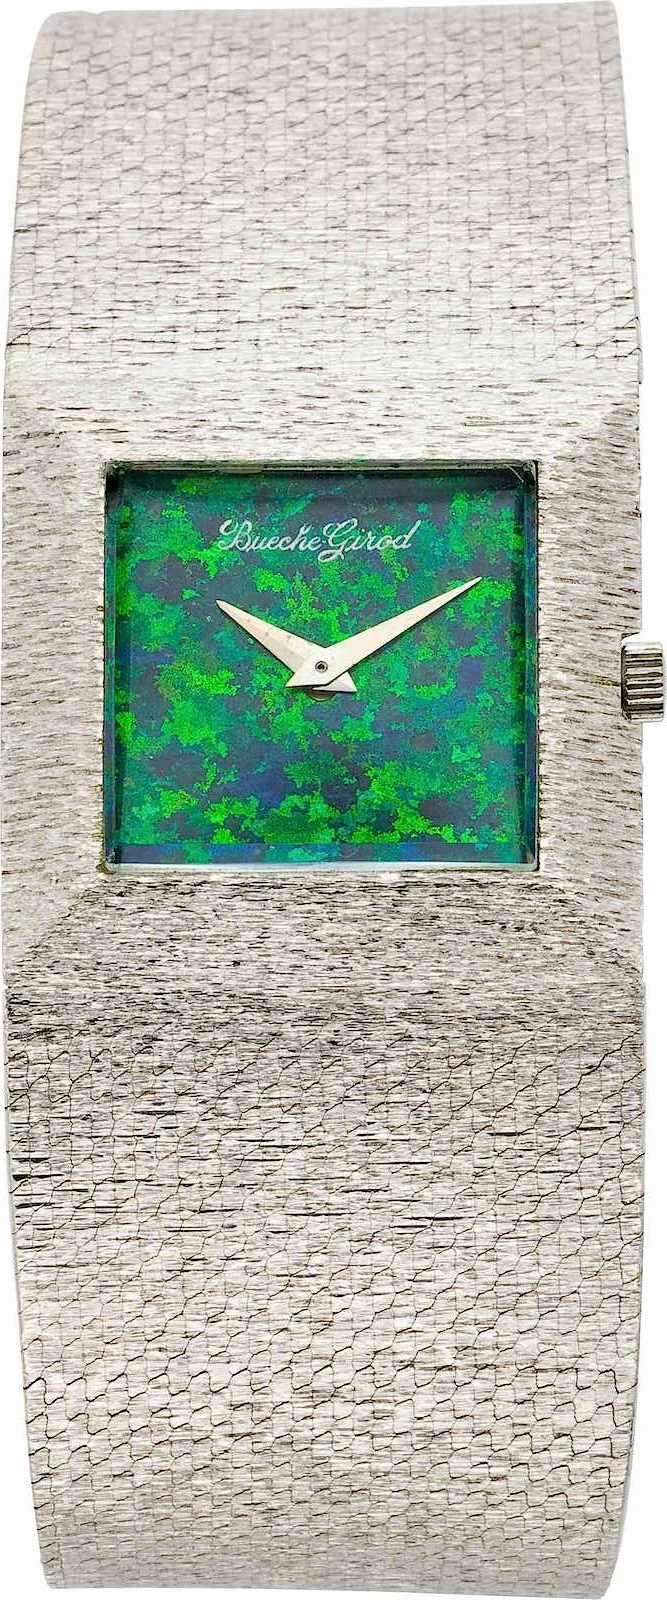 a 1975 Bueche Girod watch, color photograph